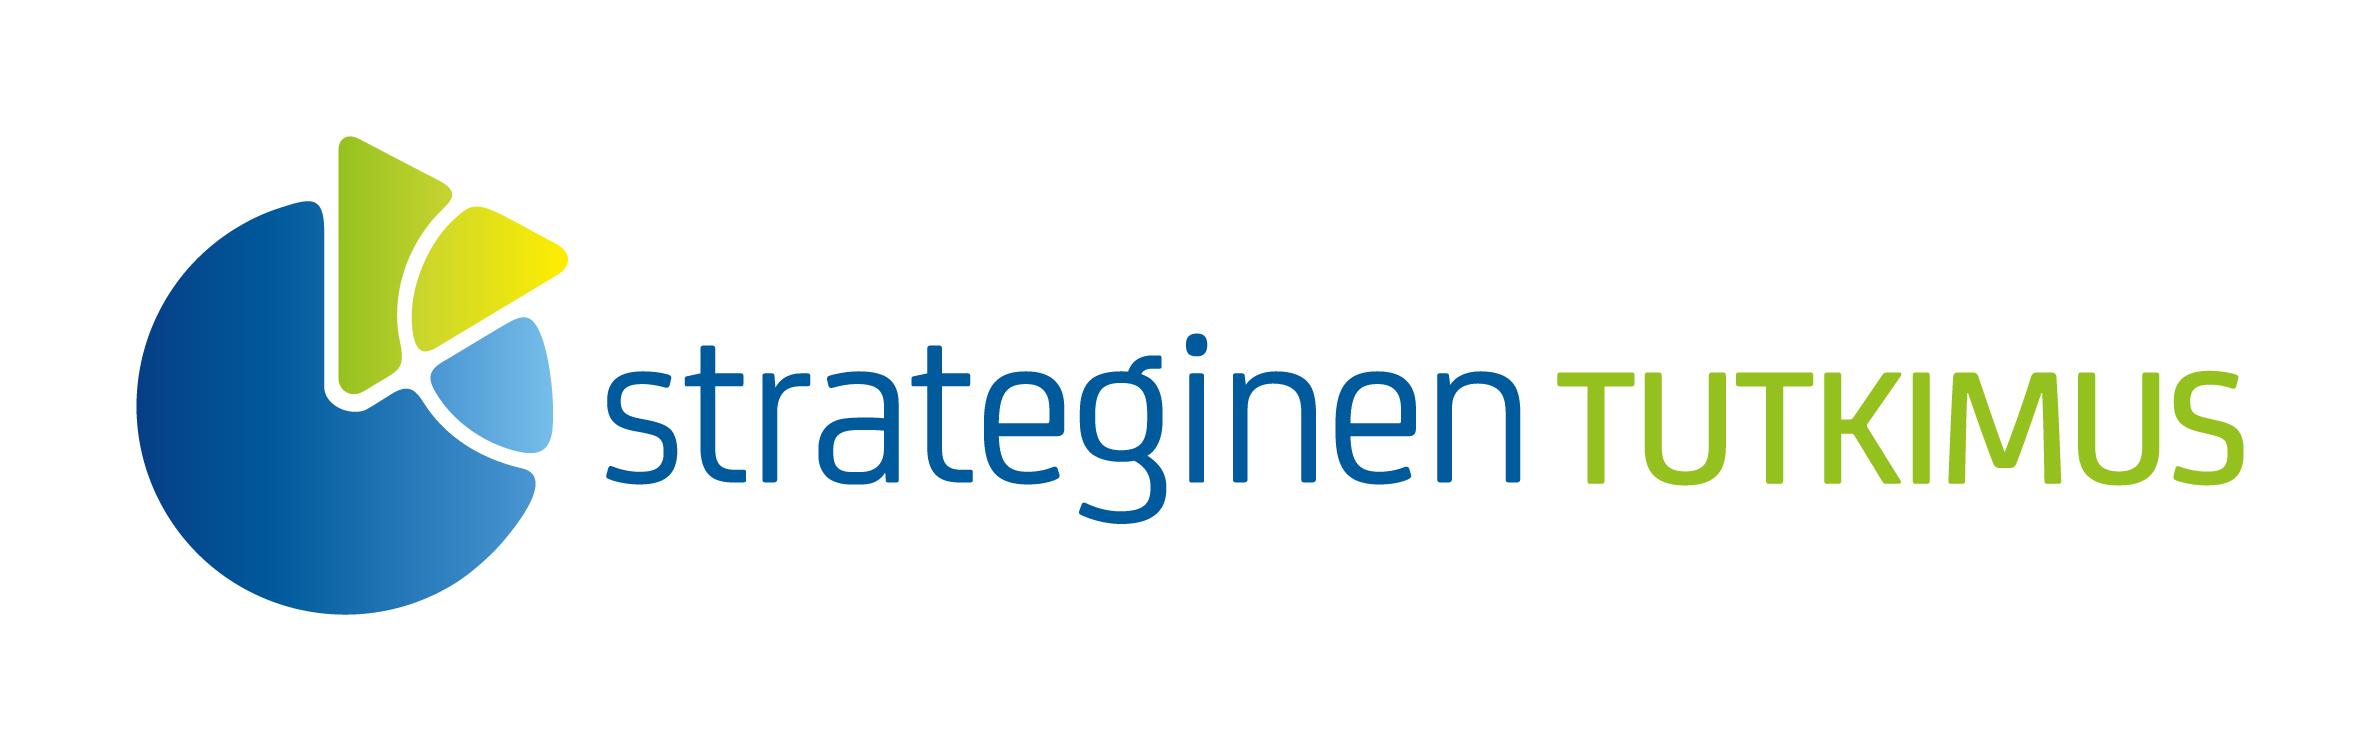 STN-logo.jpg